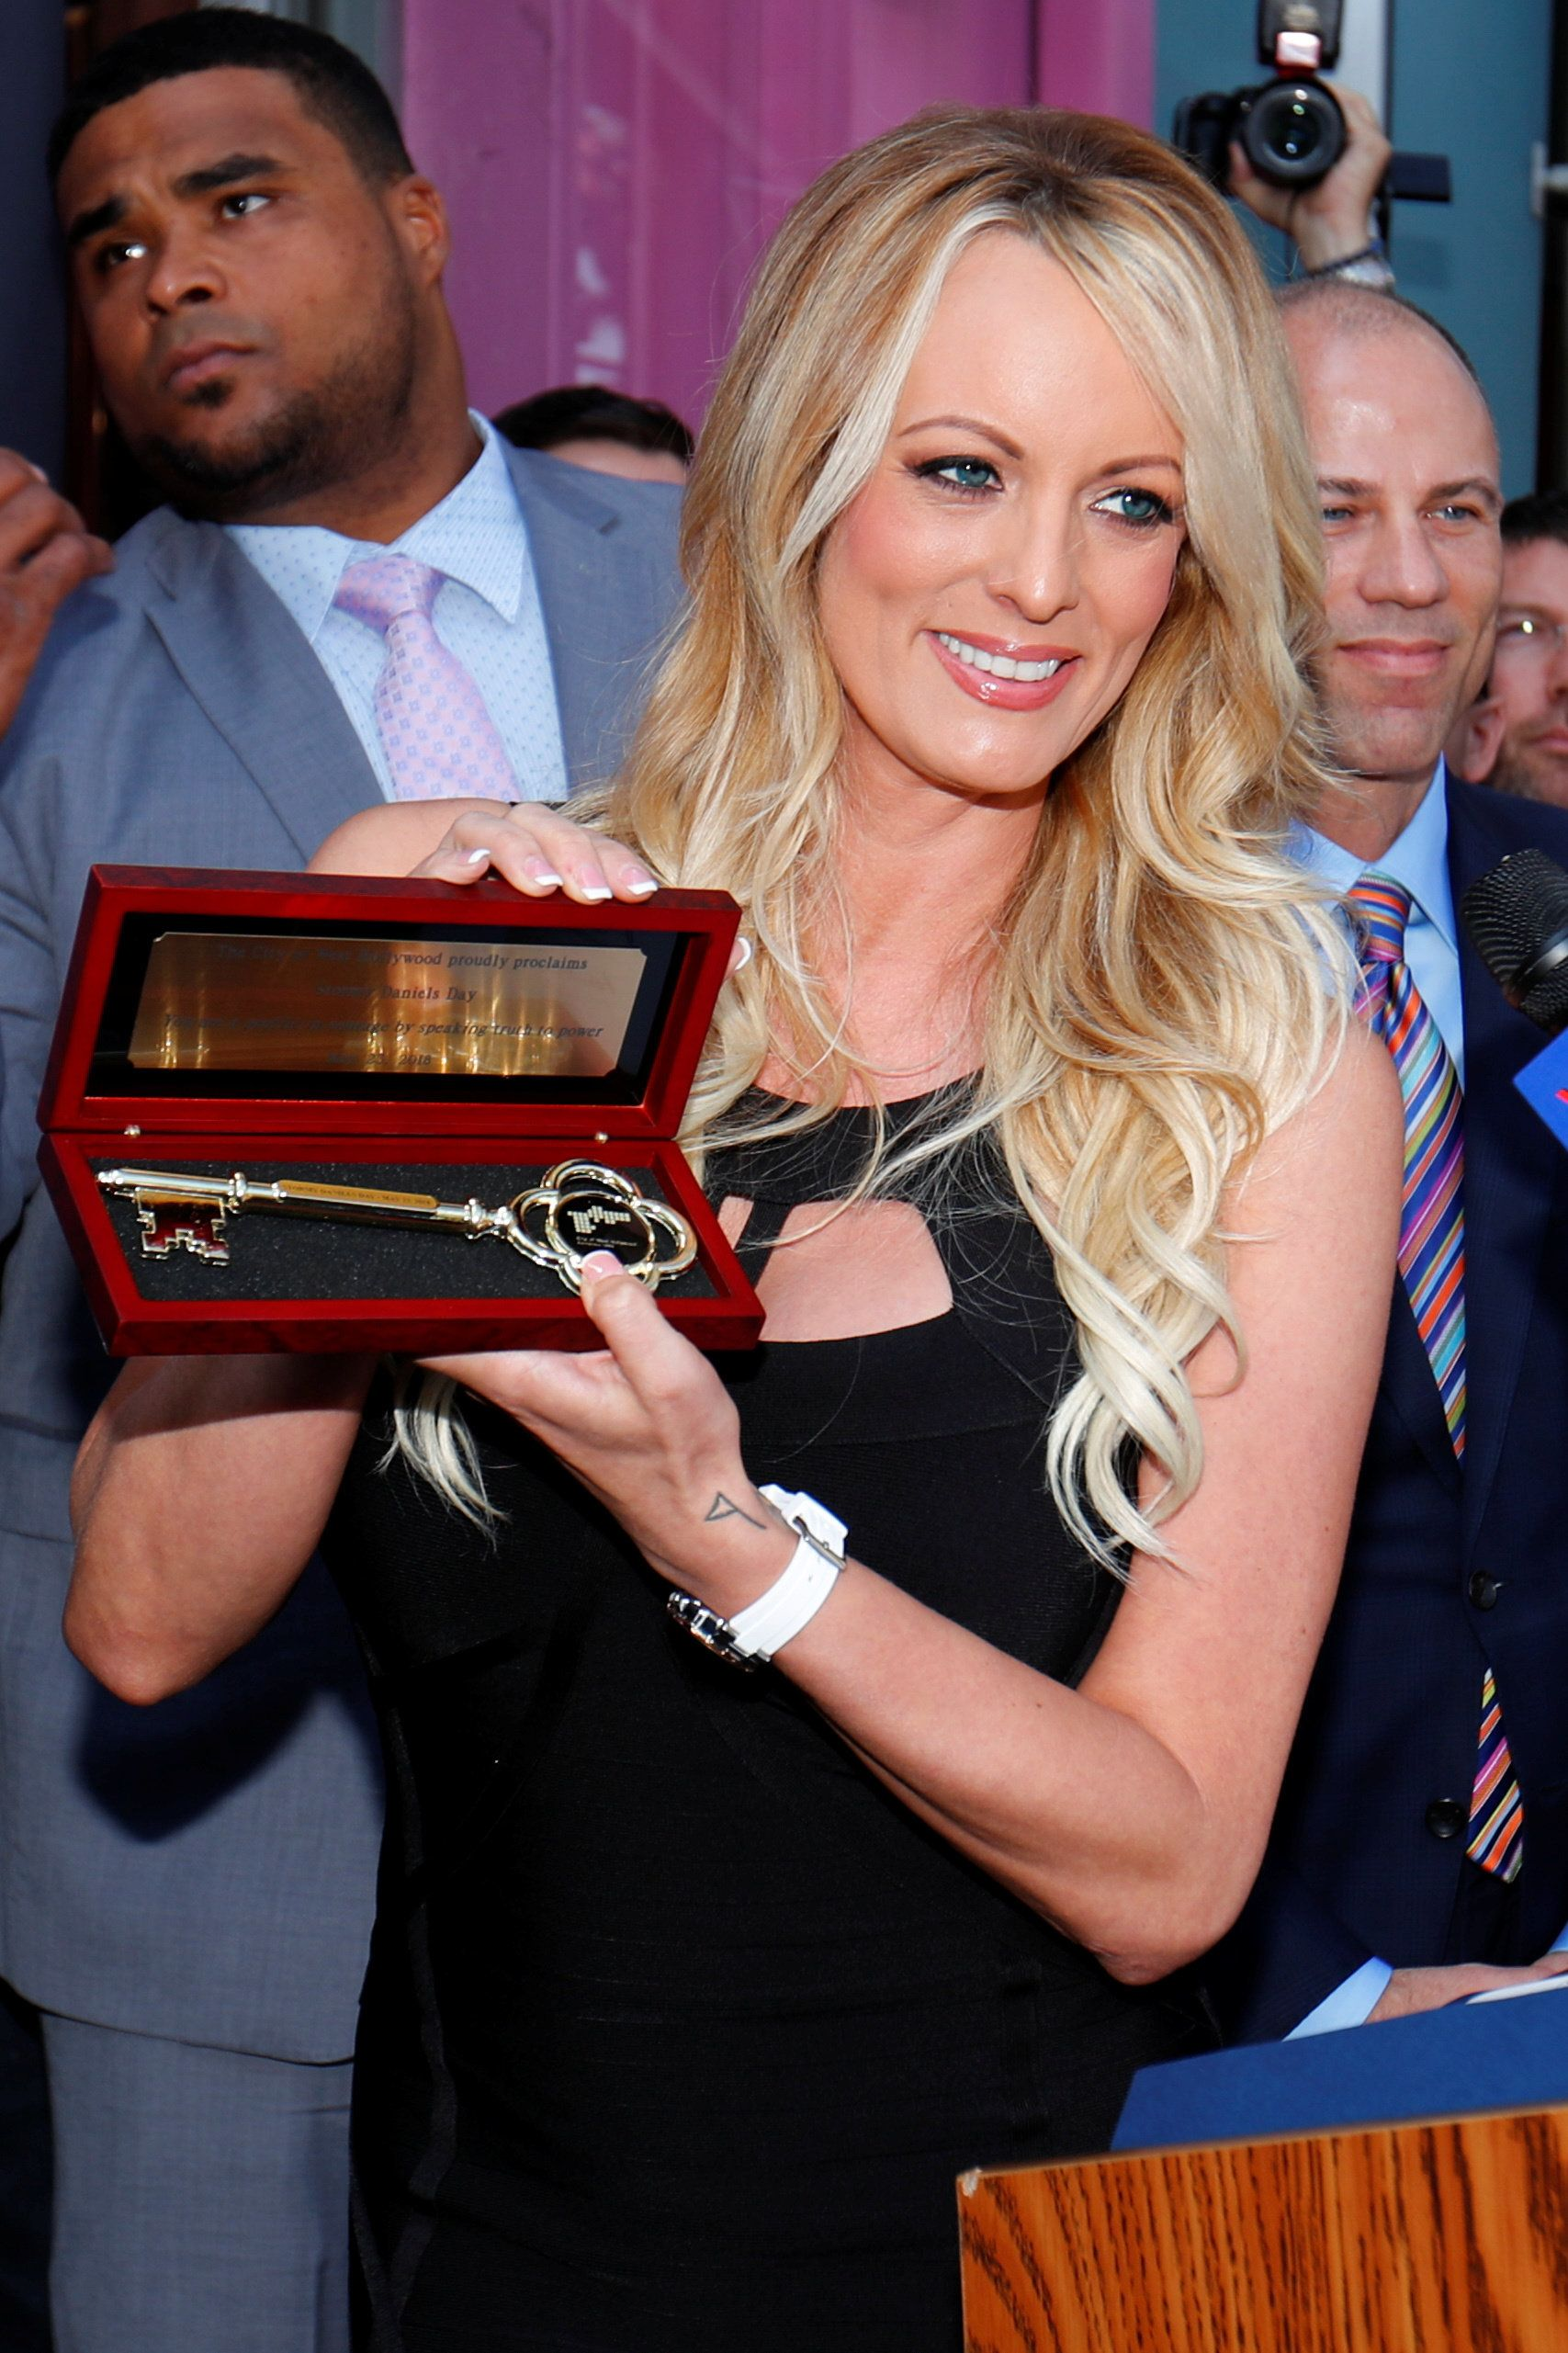 Adult film star Stormy Daniels receiveda keyto West Hollywood, California, on Wednesday fortaking on Presid